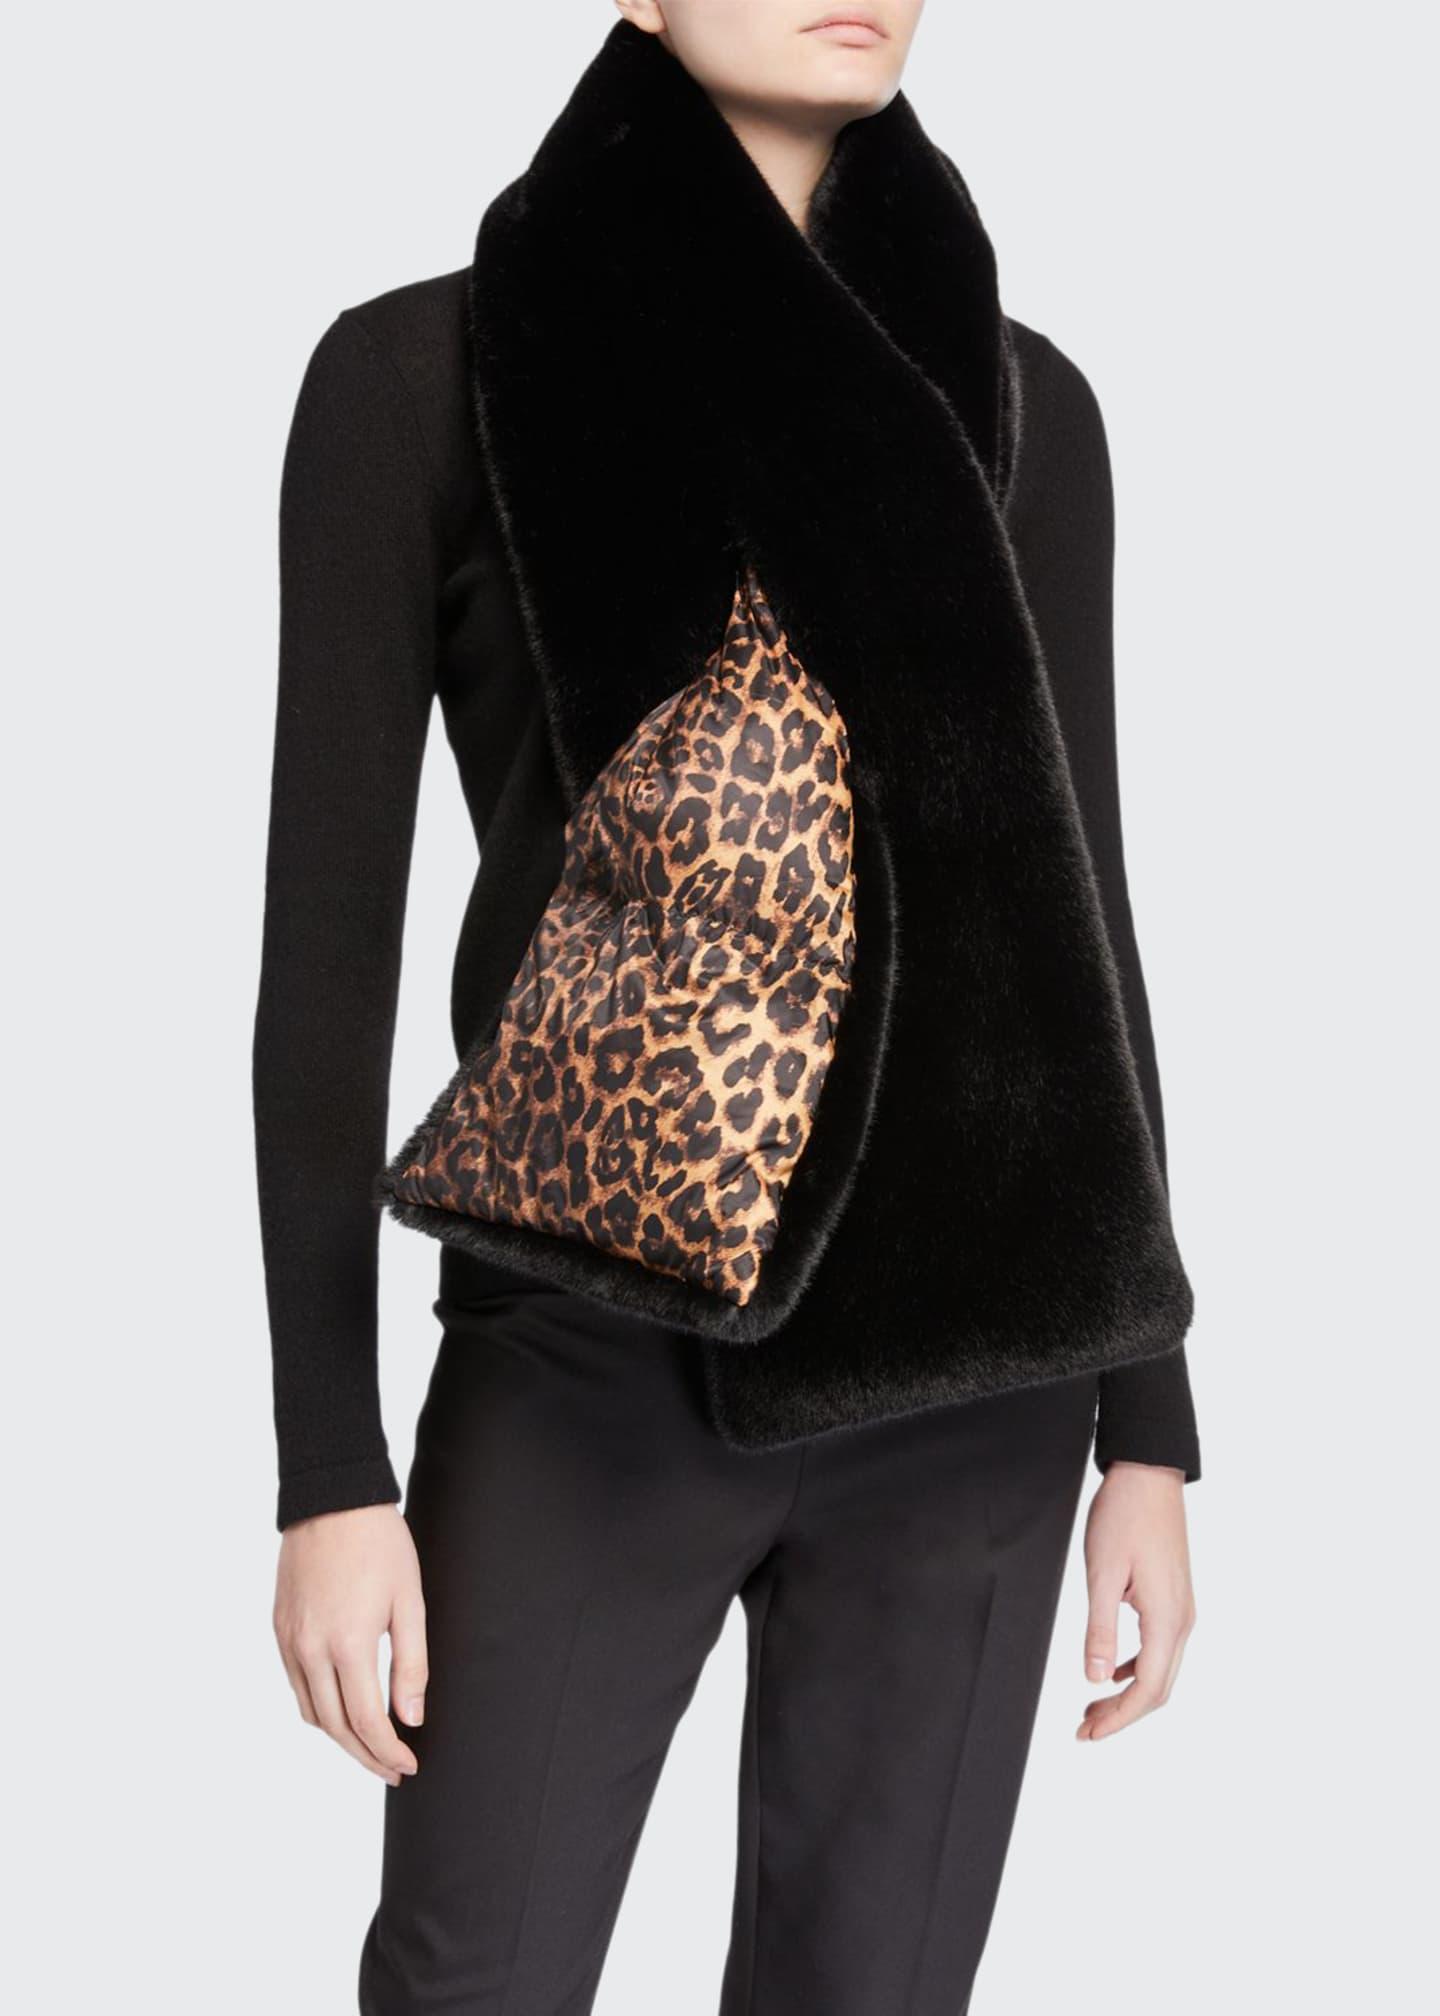 Heurueh Leopard Print & Faux Fur Double-Face Puffer